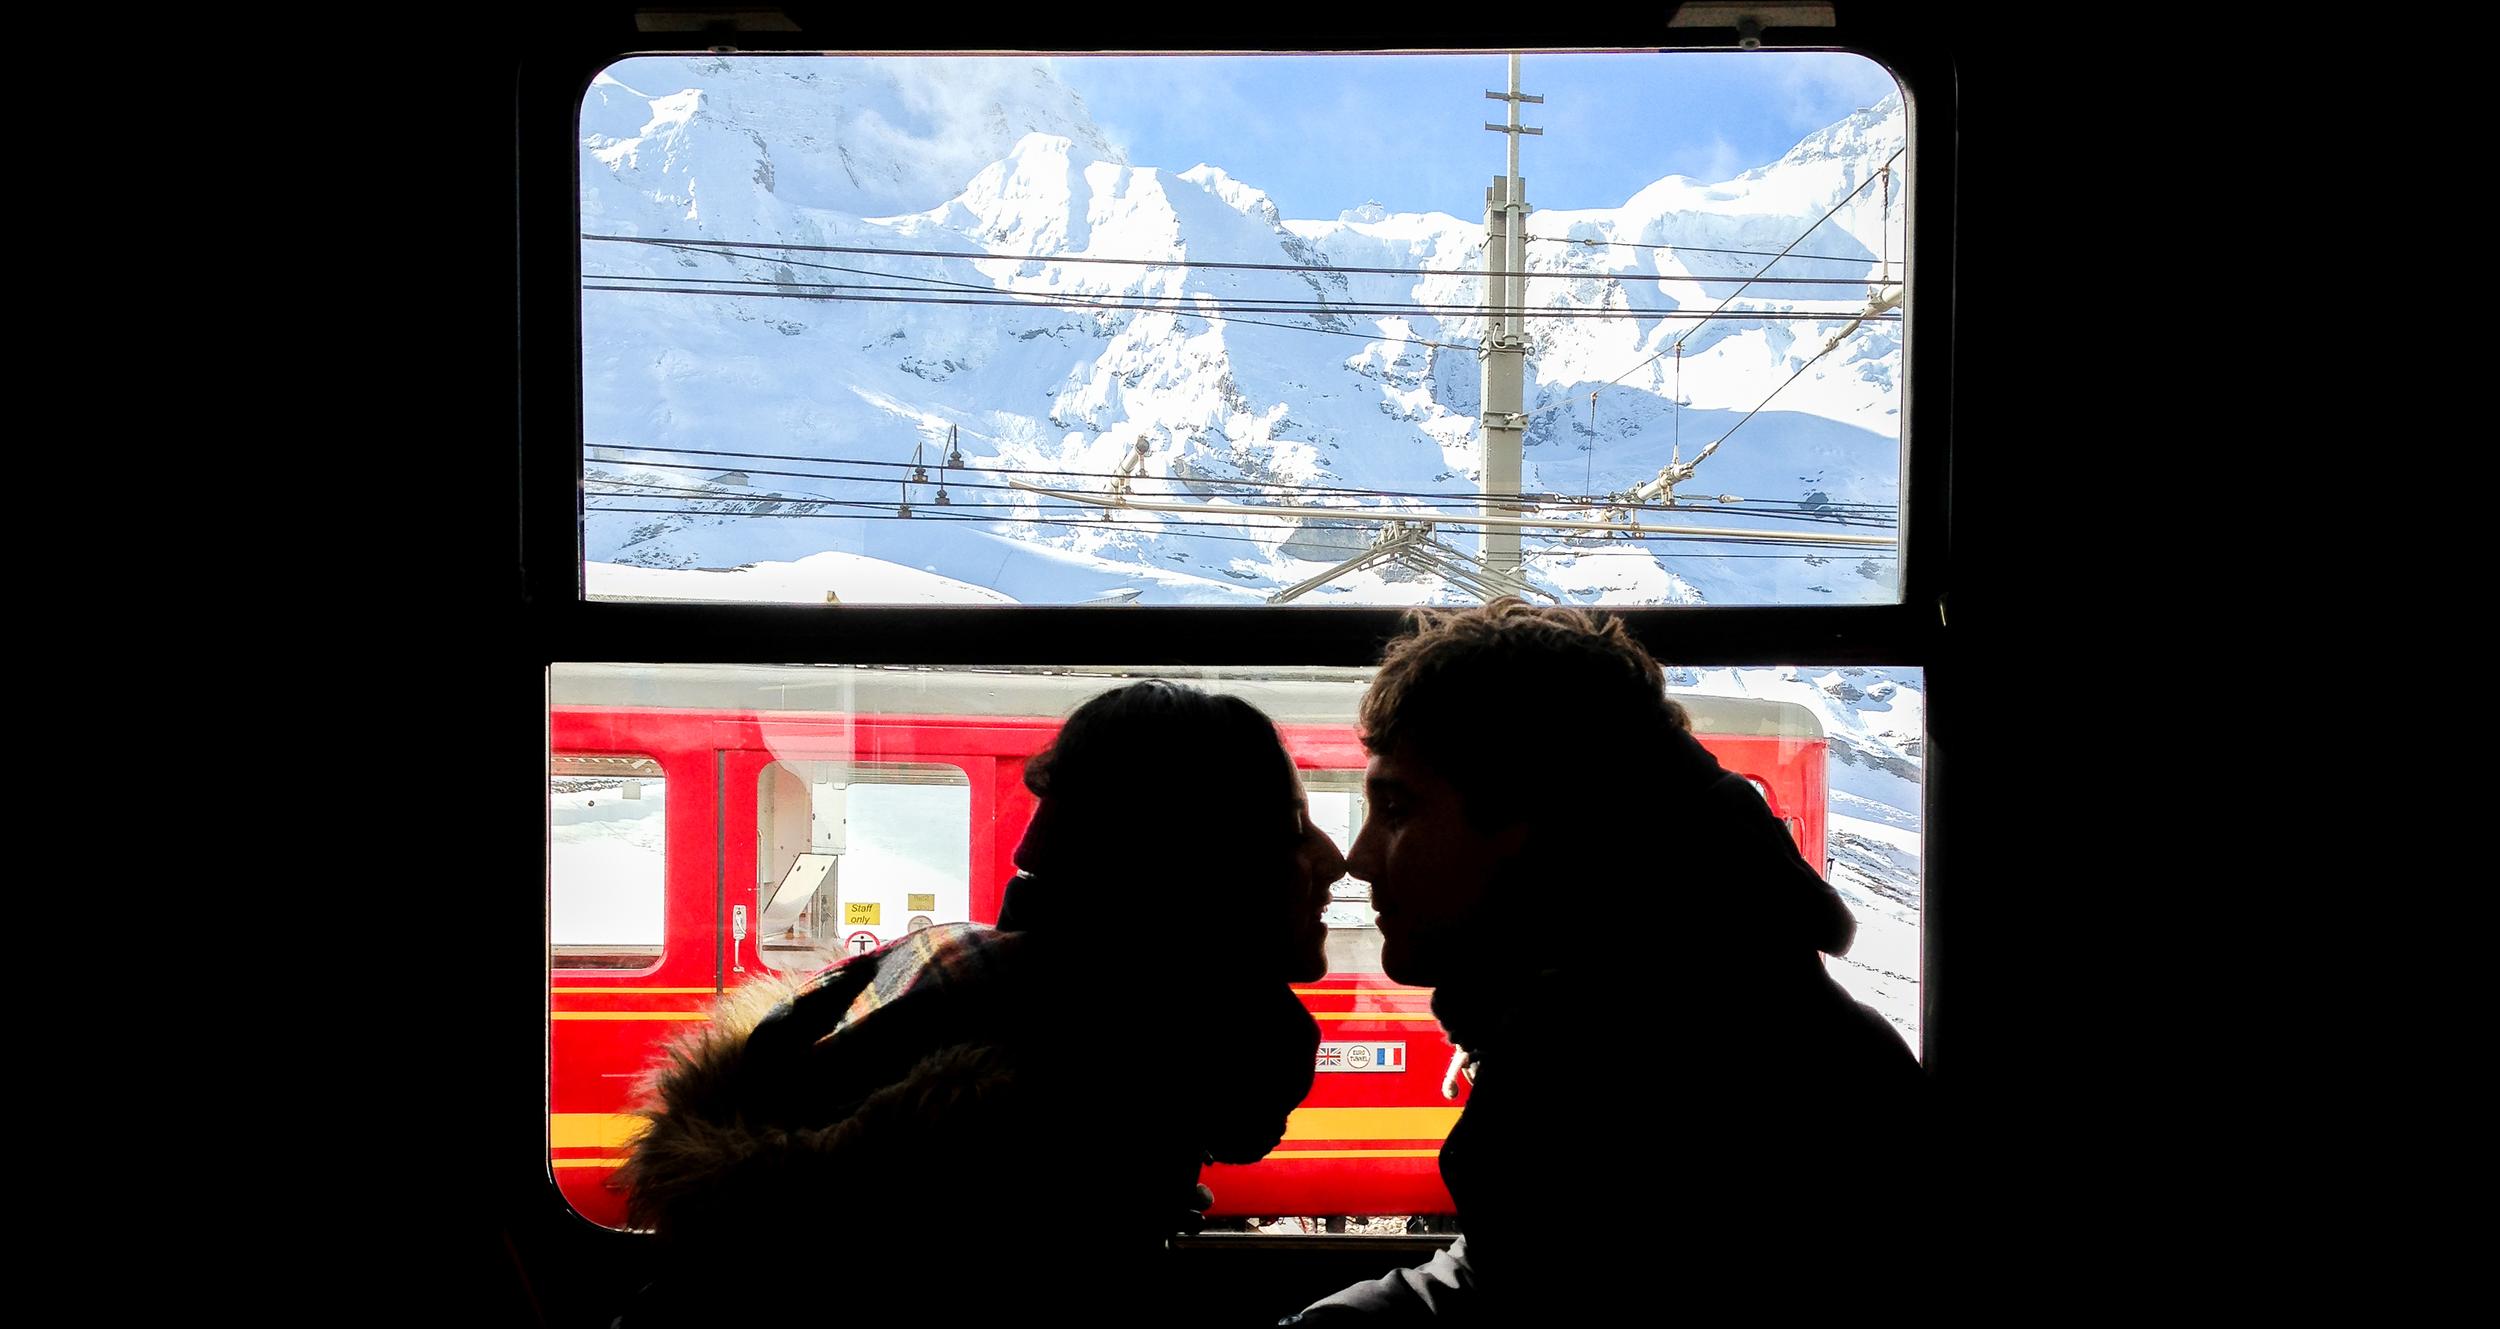 Jungfrau, Switzerland -  Priscilla De La Piedra & Luke Altamura -